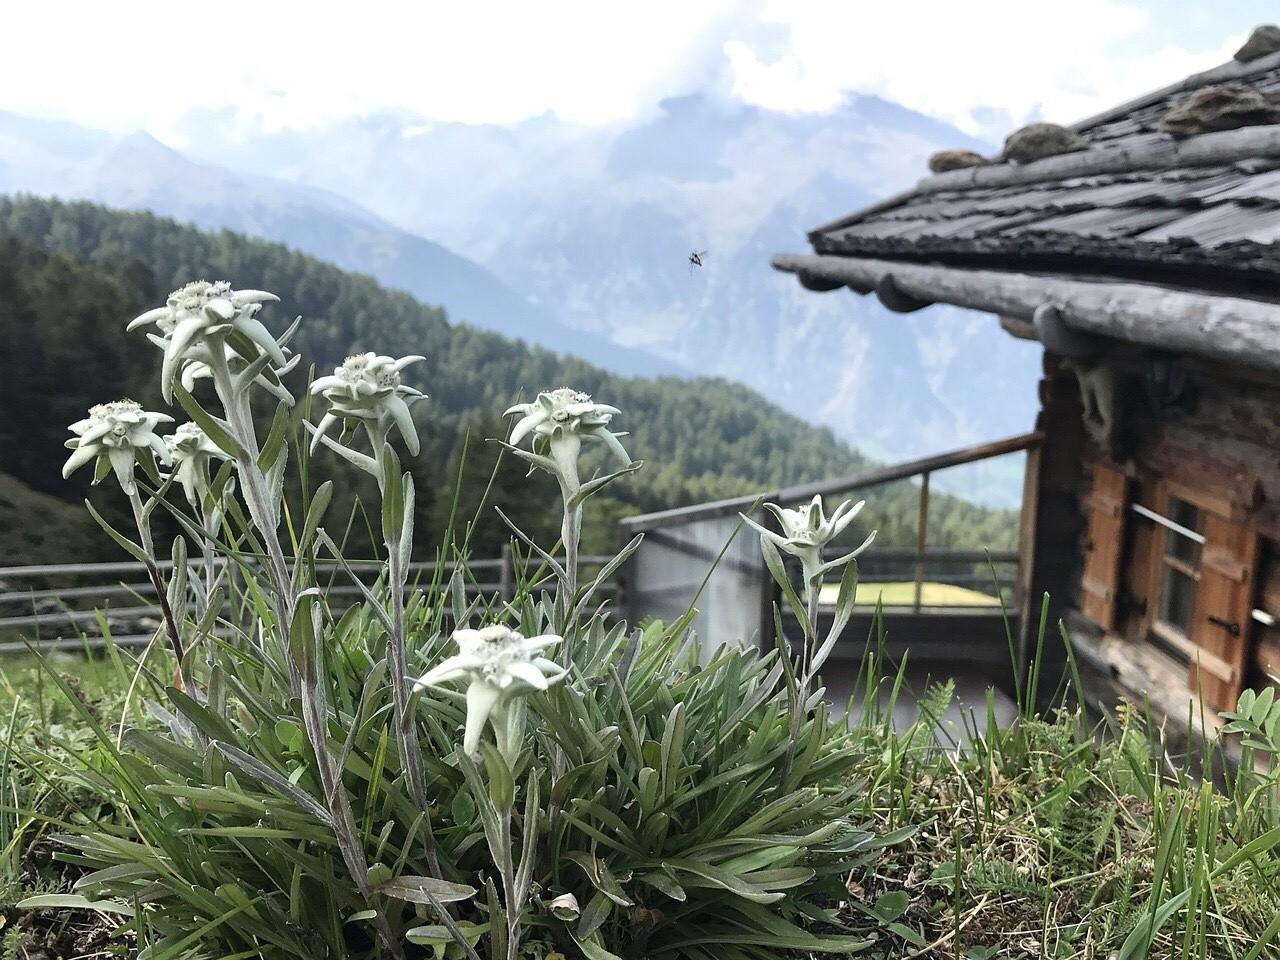 Edelweiss flower in Austrian, Bavarian mountains